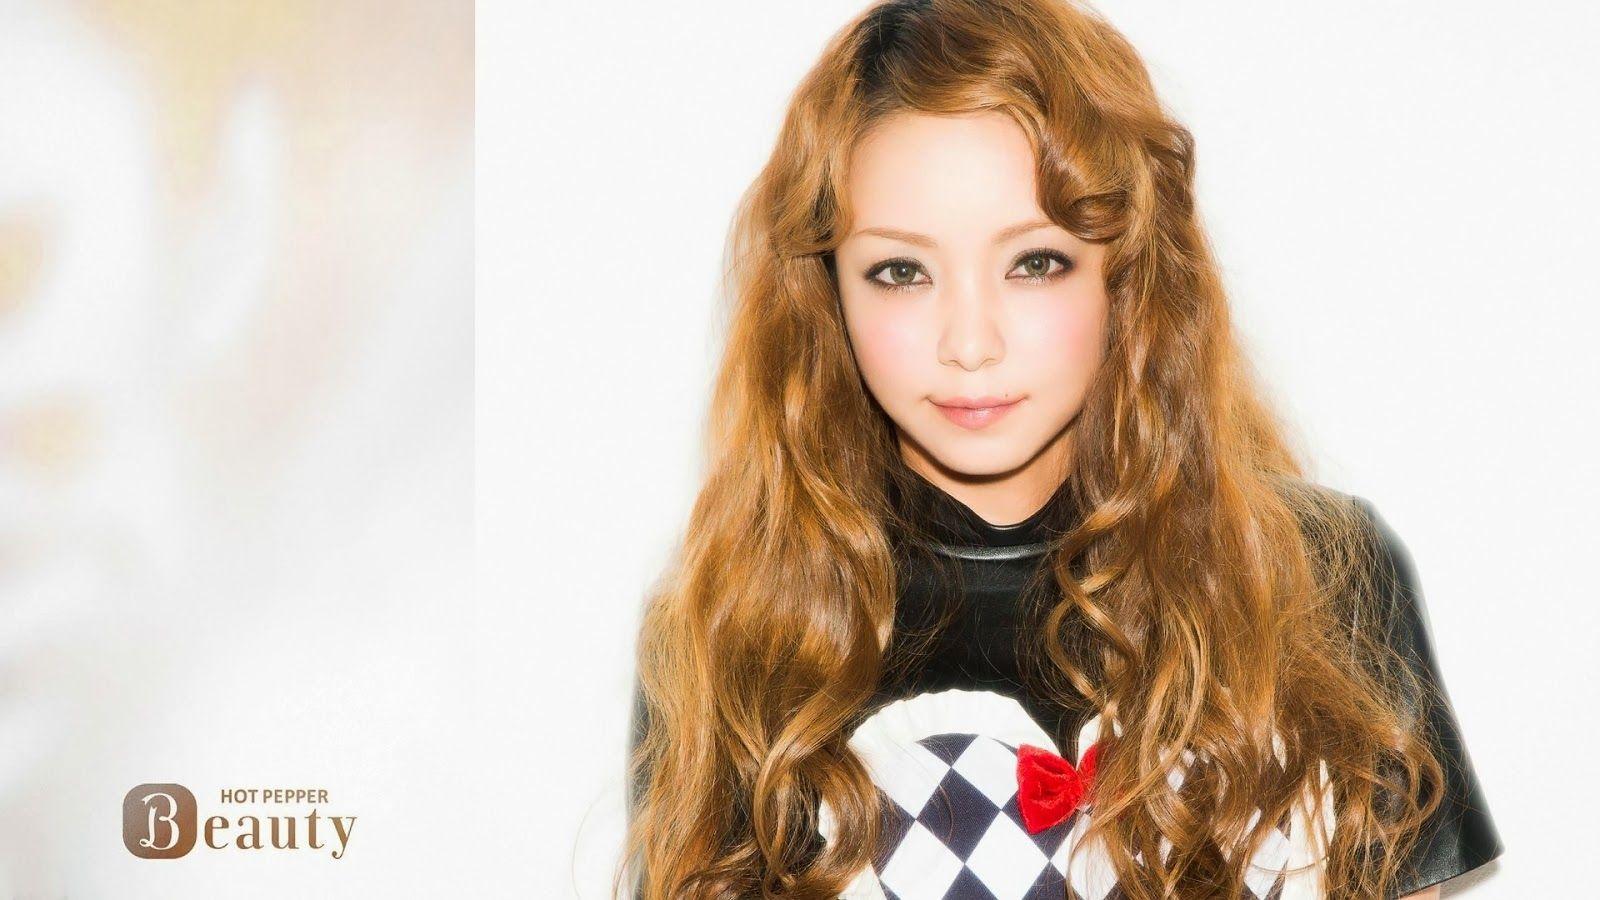 Namie Amuro With Hot Pepper Beauty ファッションアイデア 奈美恵